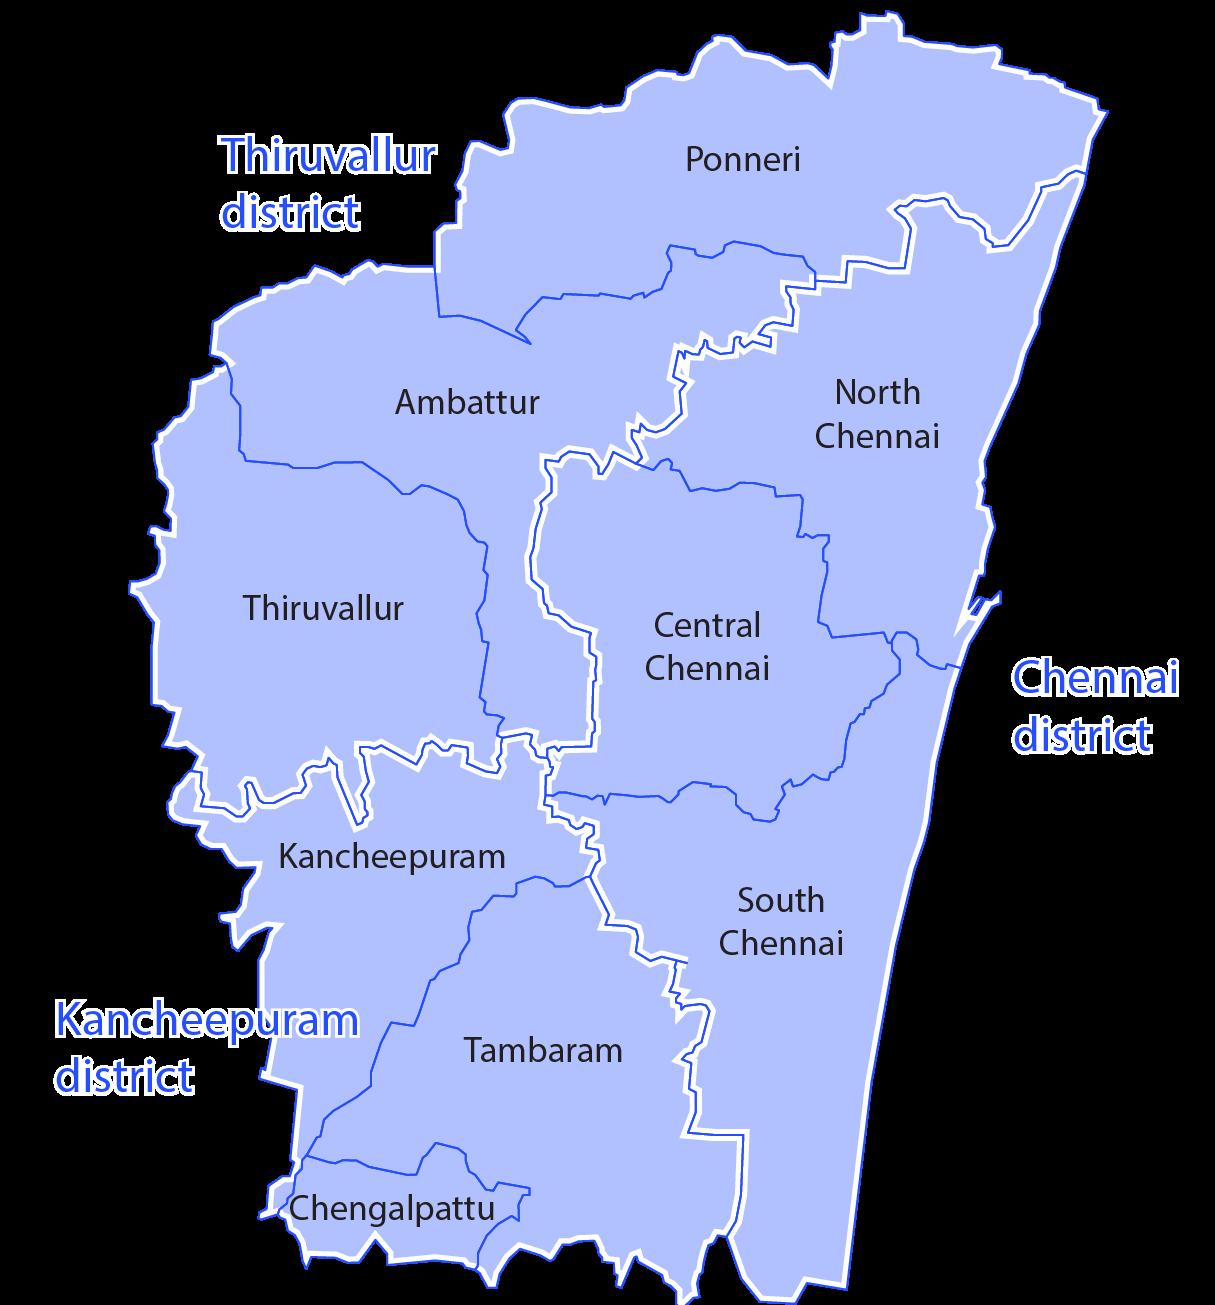 Speculation on Property in Chennai: Location Porur